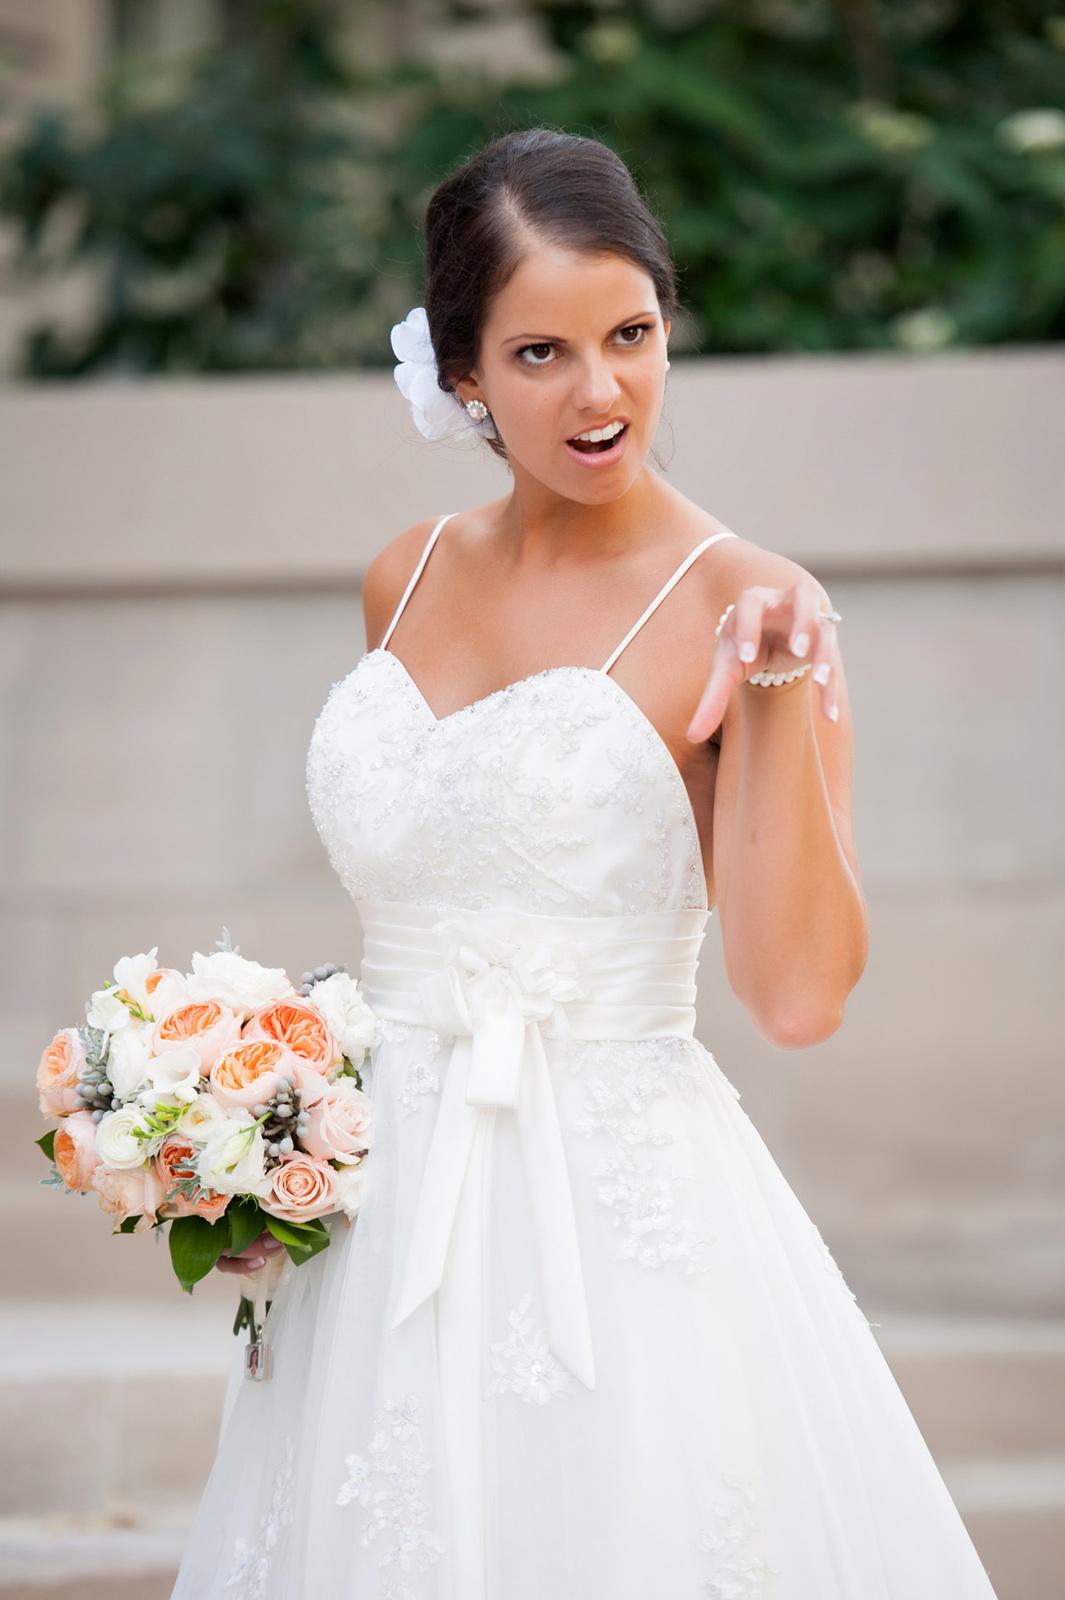 minnesota-wedding-photographers-mark-kegans-937.jpg